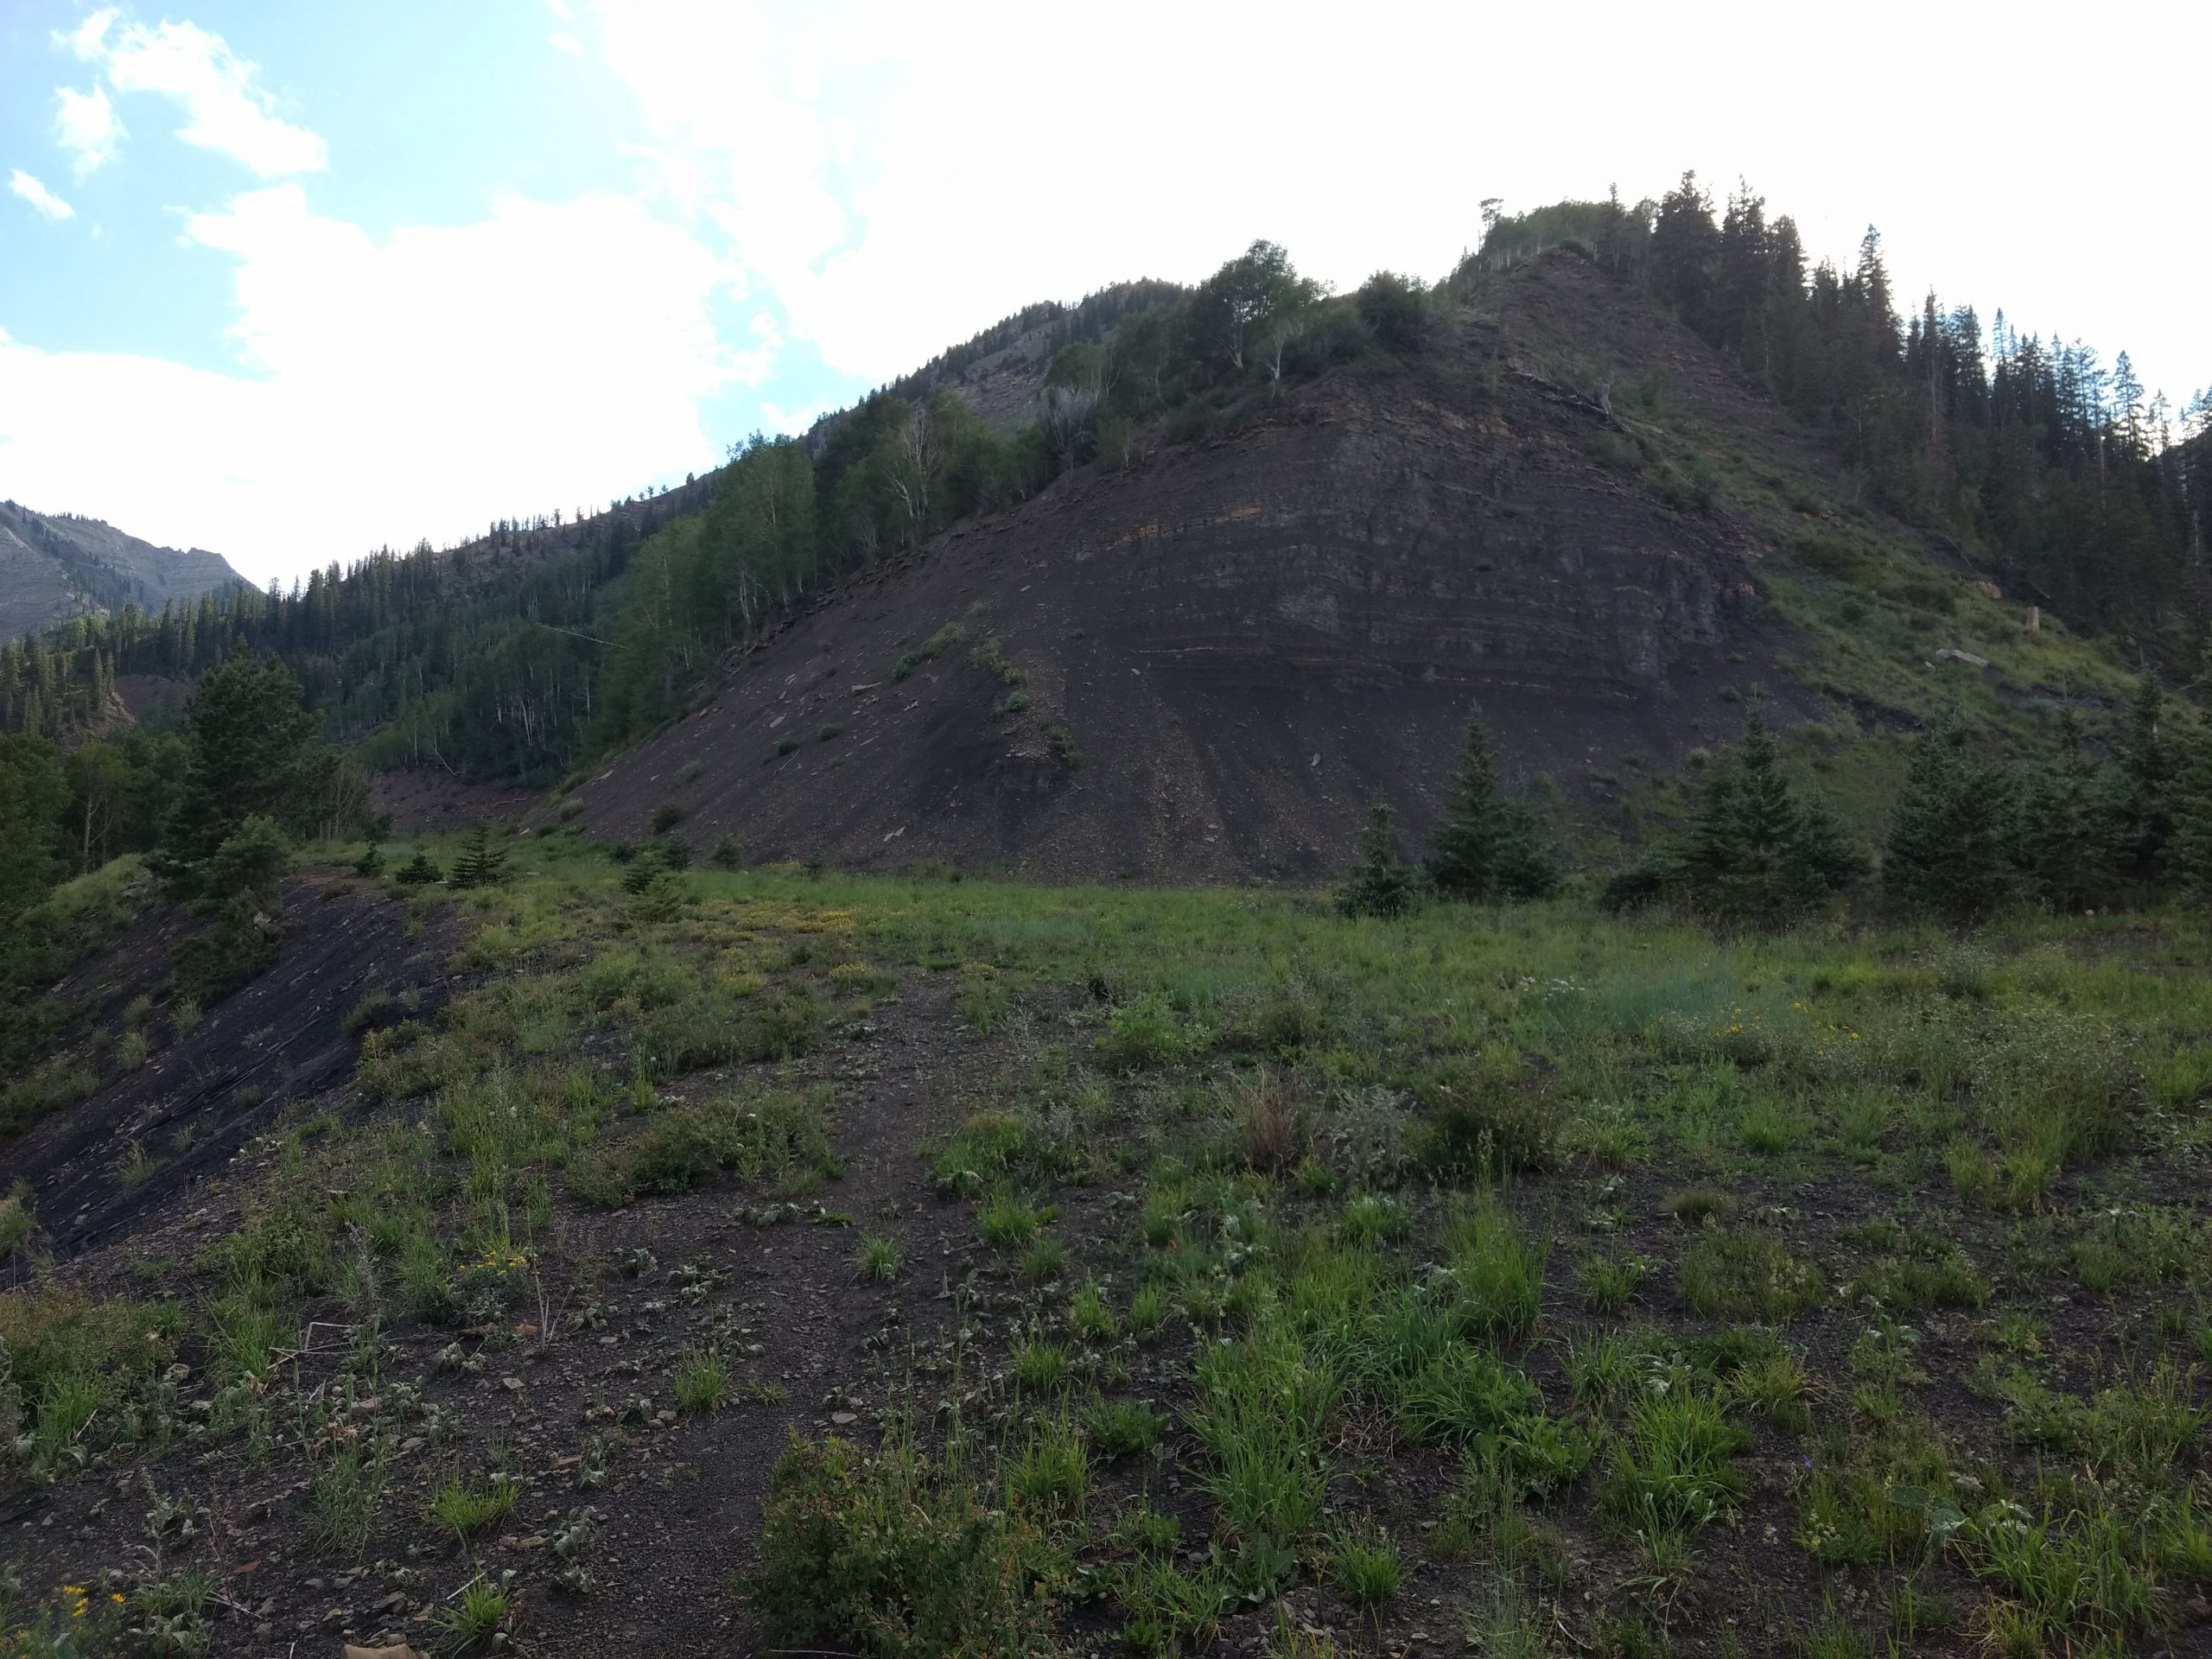 Coal Mine Methane Emissions